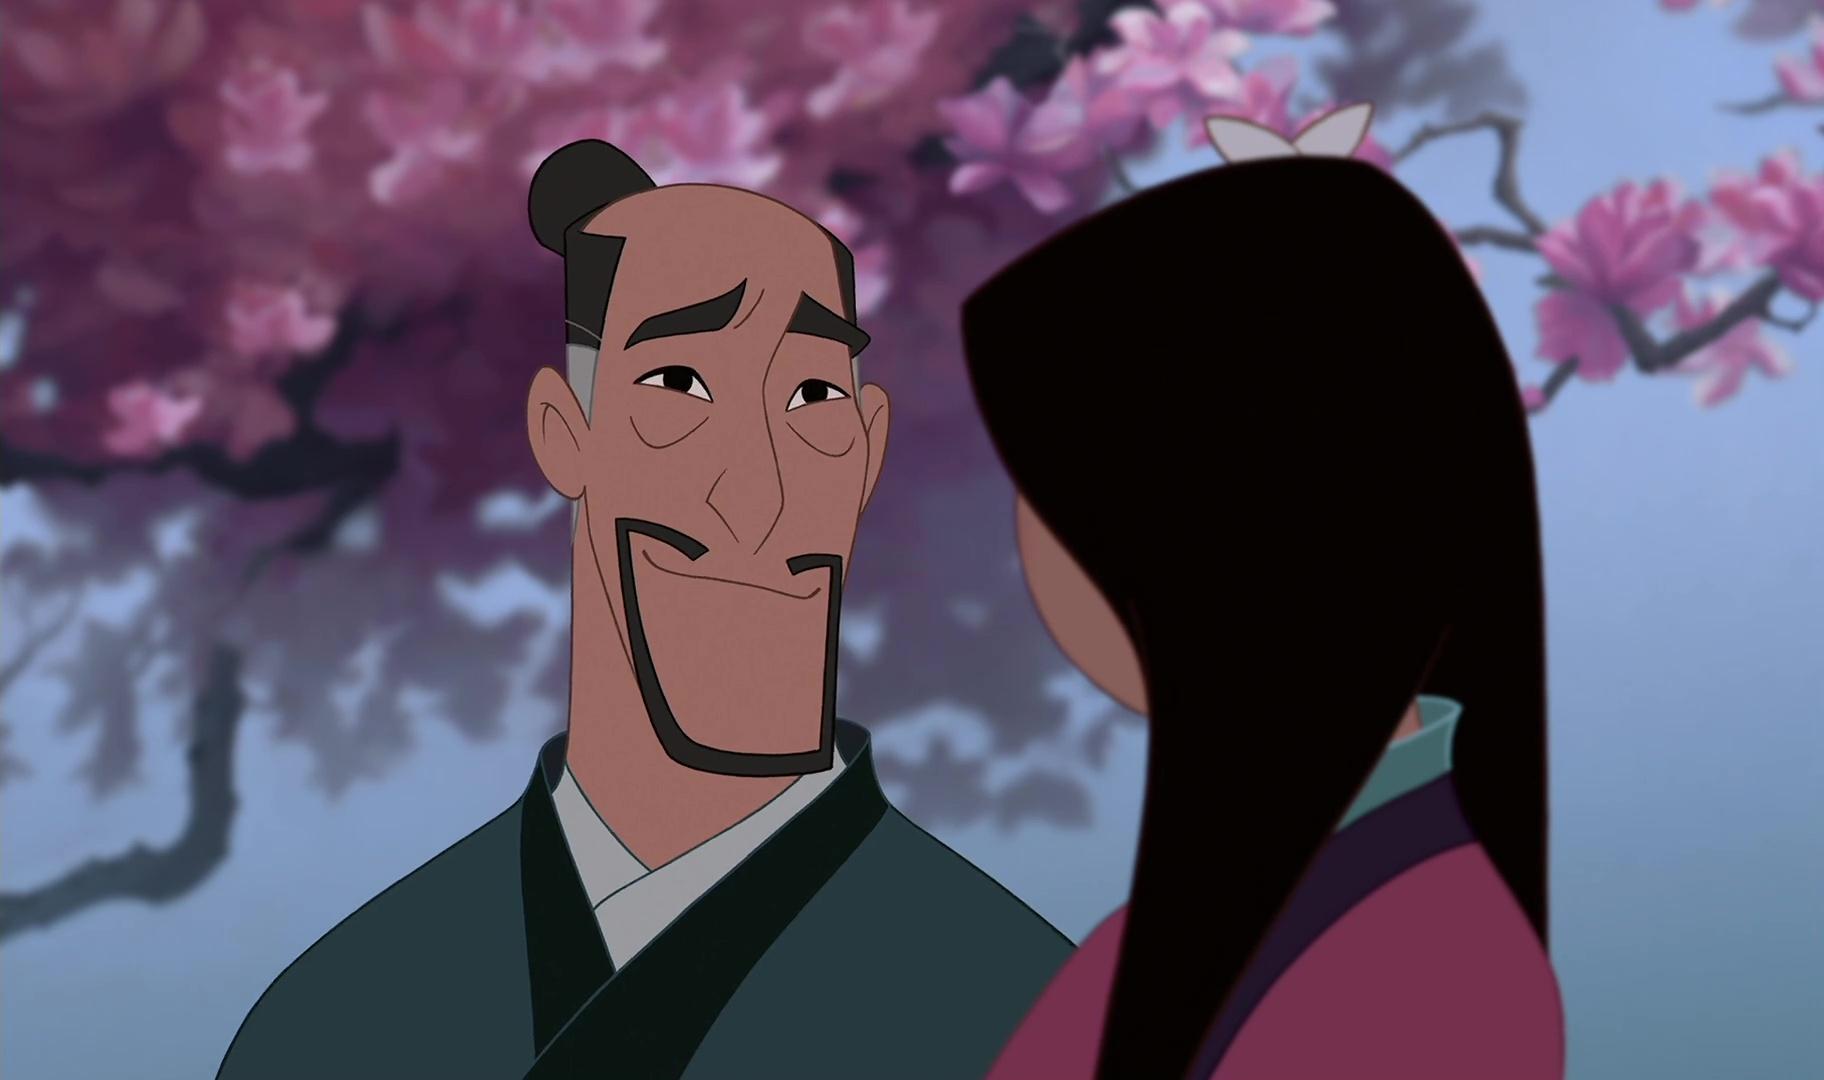 Uncategorized Fa Zhou fa zhou personnage dans disney planet en images zhou